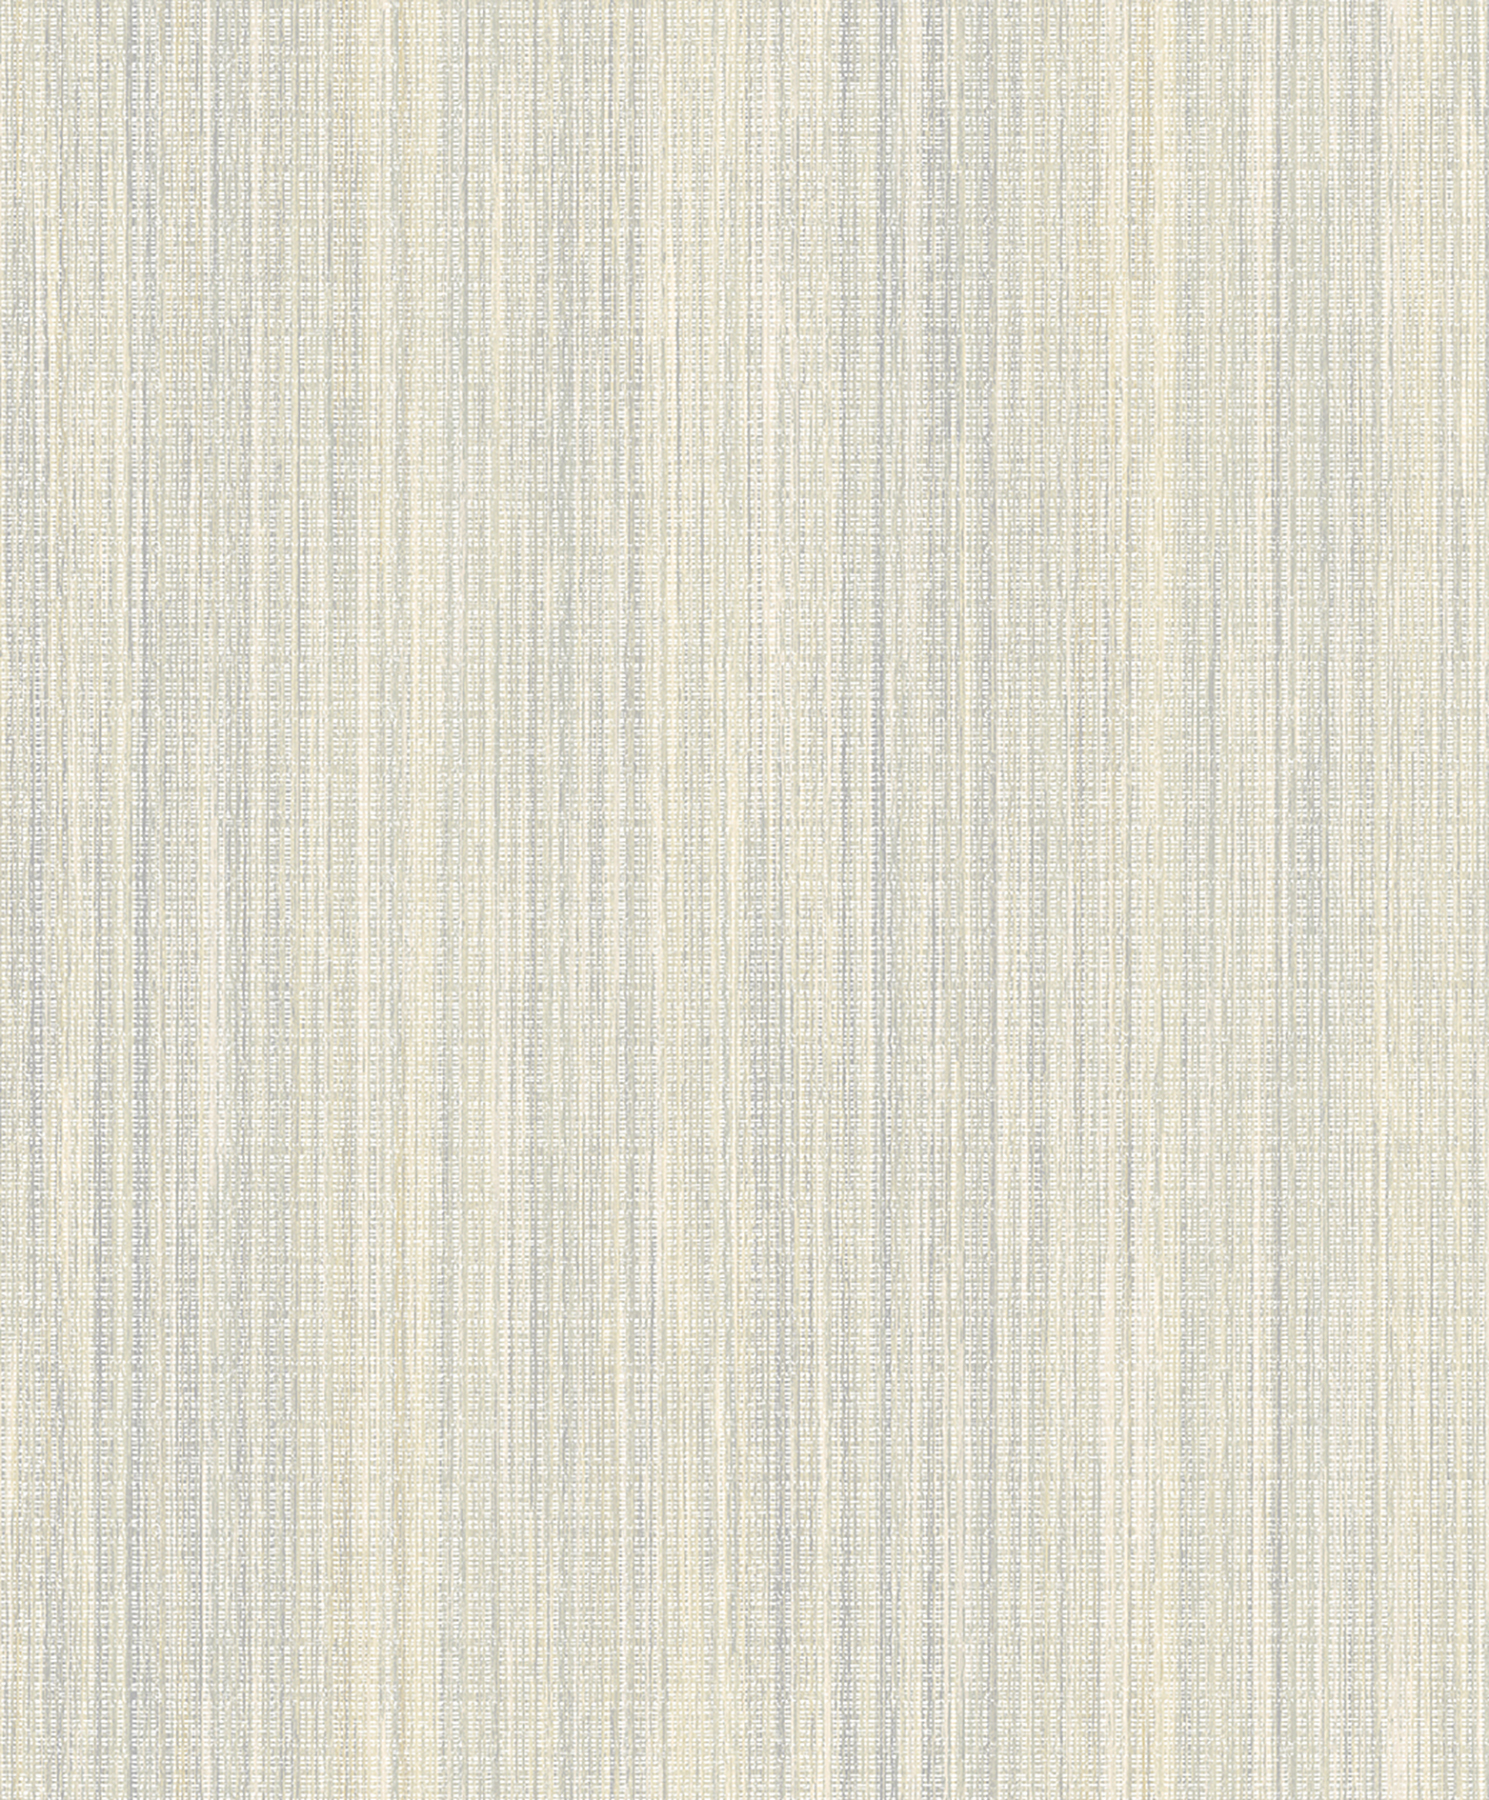 Picture of Audrey Honey Stripe Texture Wallpaper